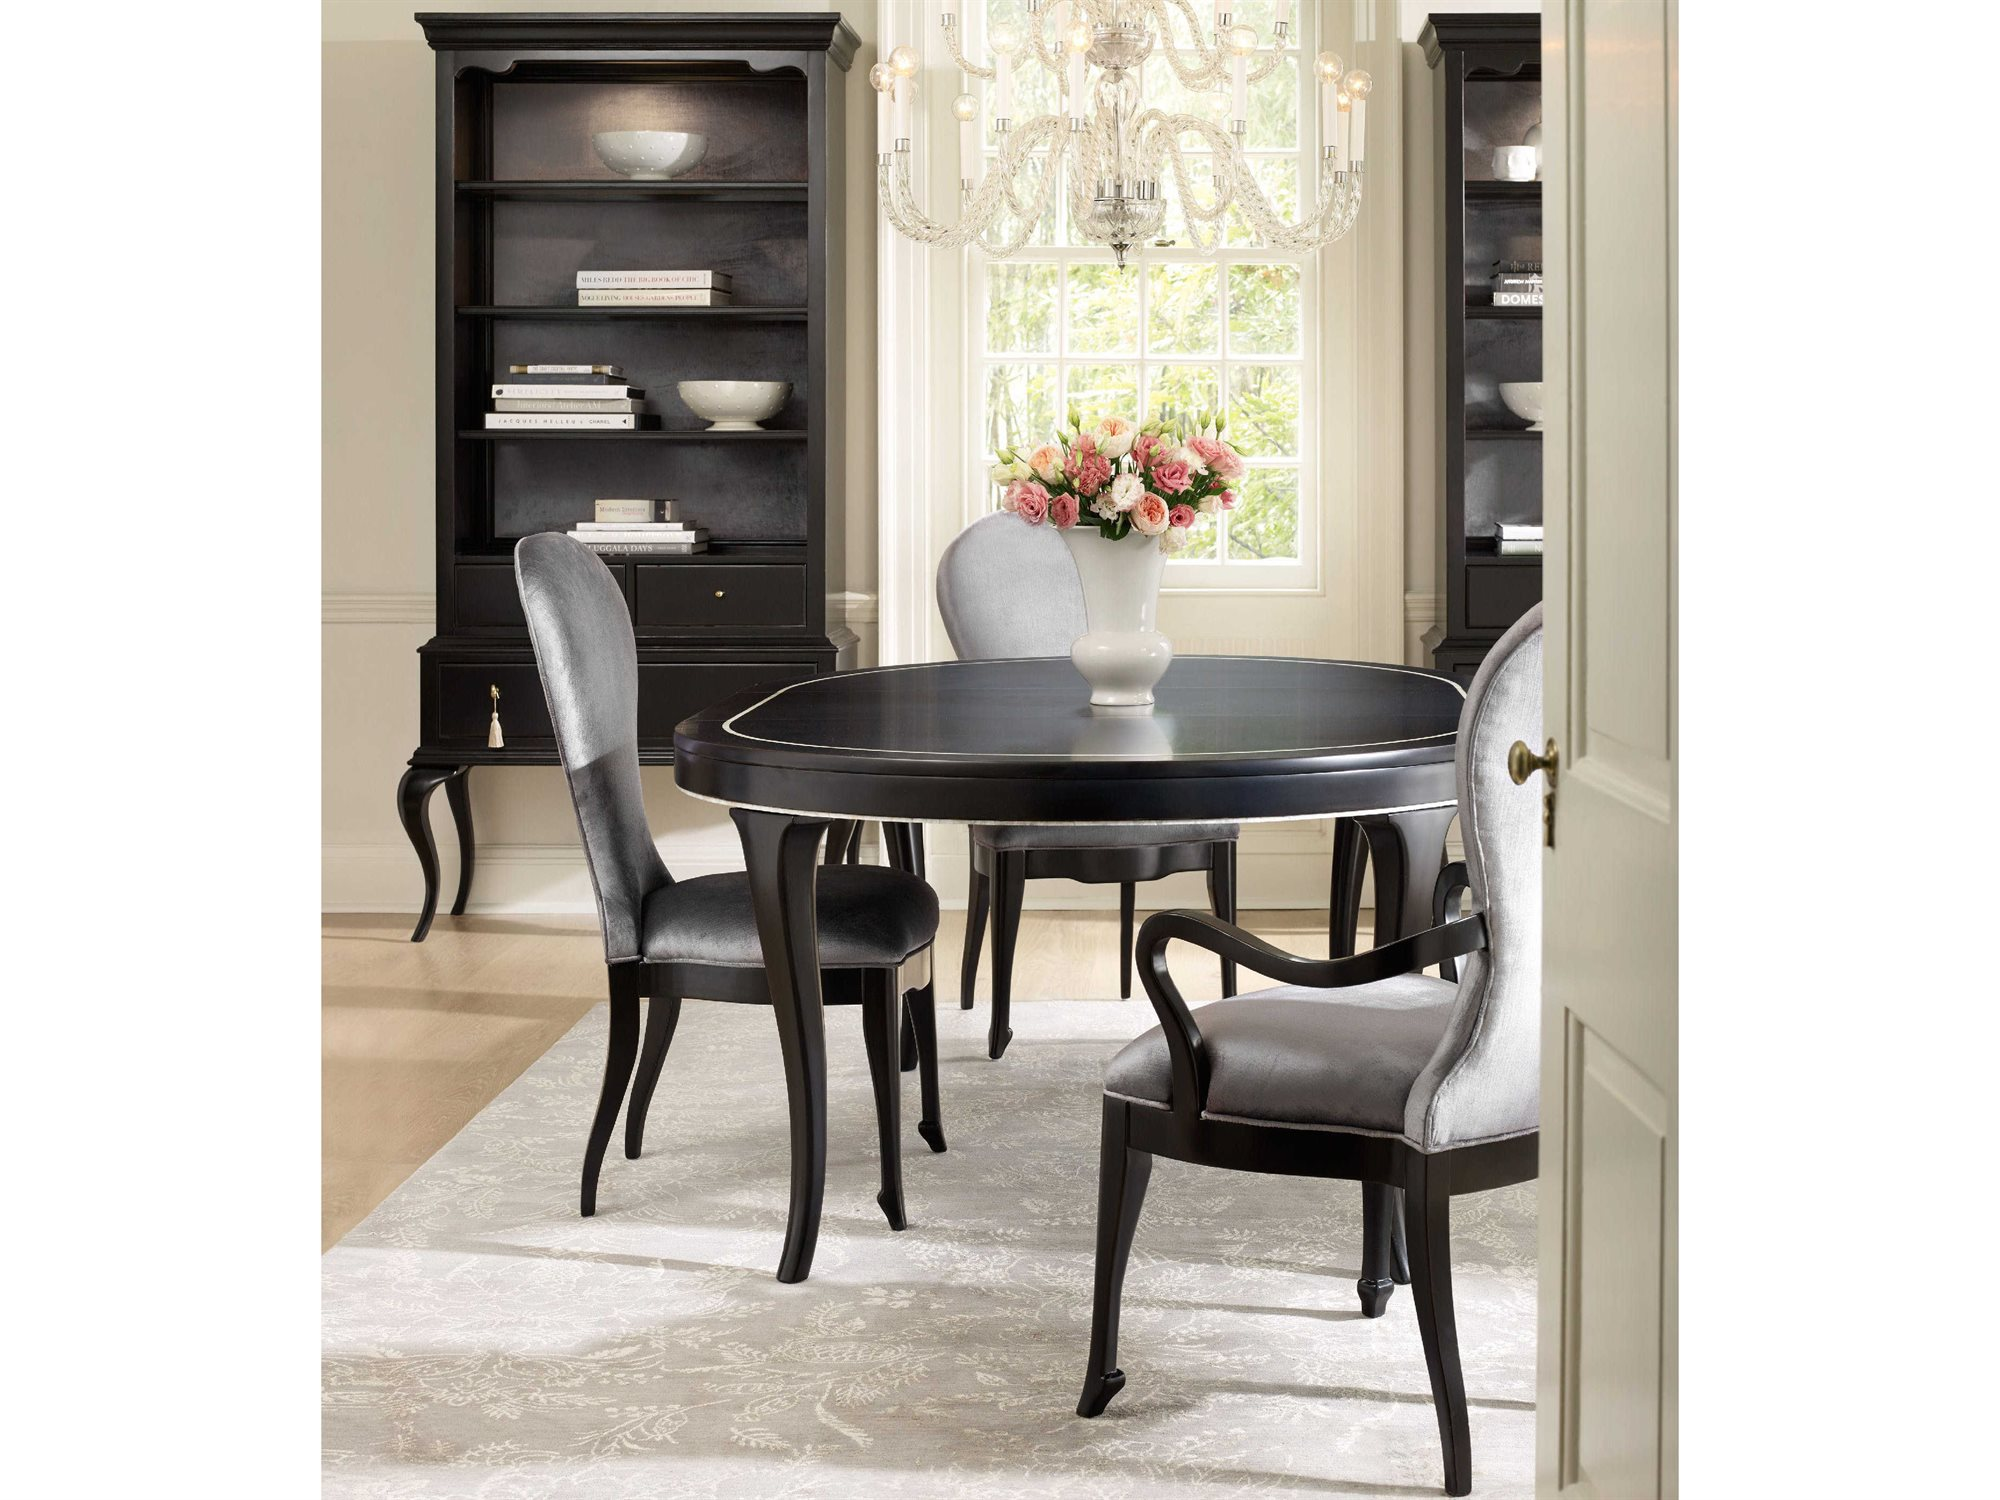 Hooker Furniture Cynthia Rowley Dining Room Set